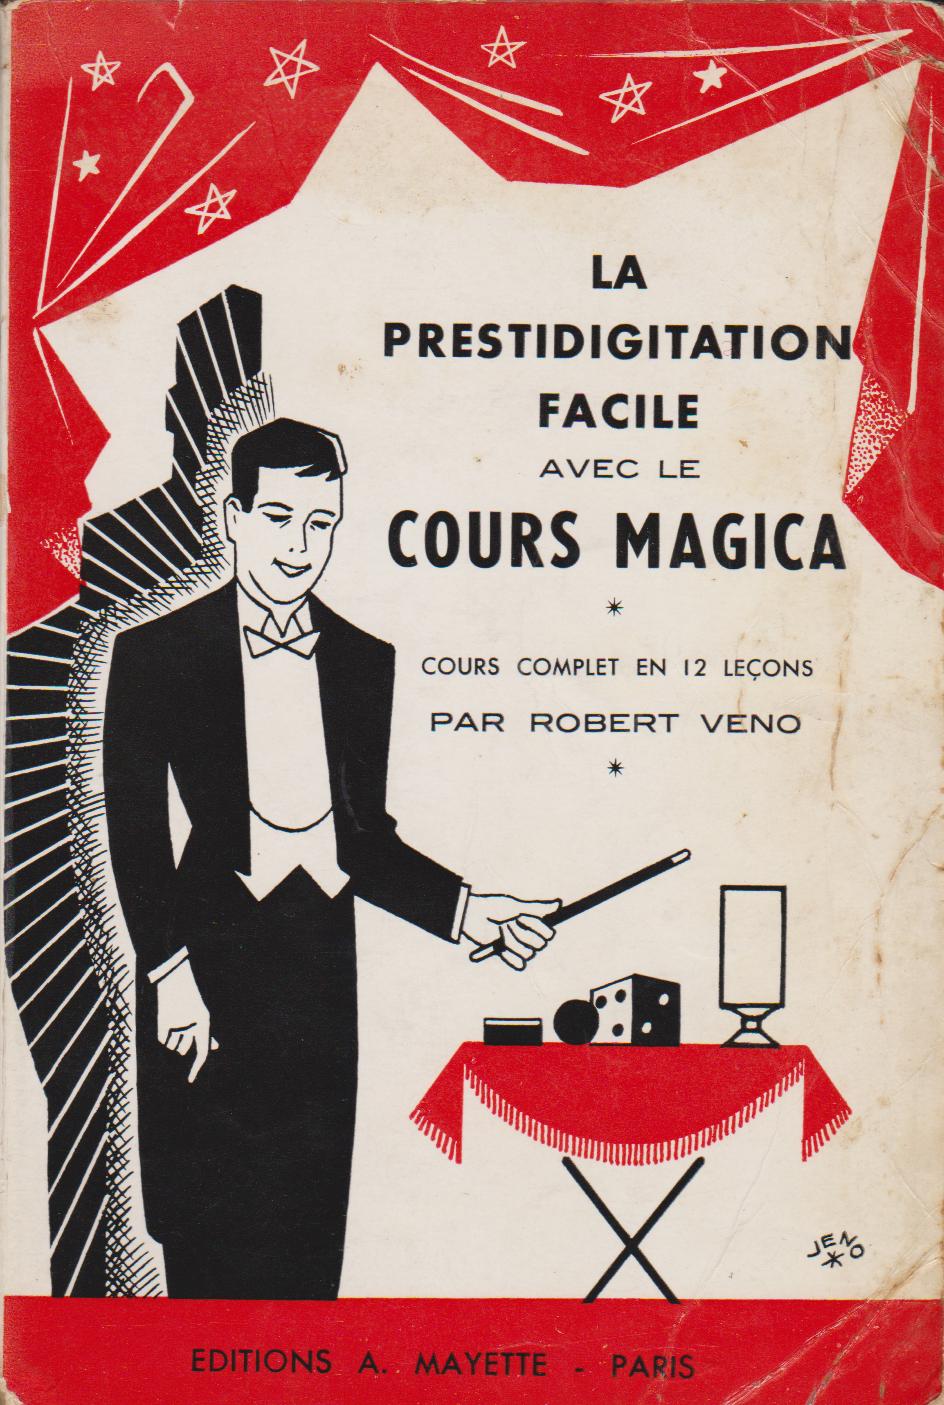 LA PRESTIDIGITATION FACILE AVEC LE COURS MAGICA (ROBERT VENO) - Académie de  magie